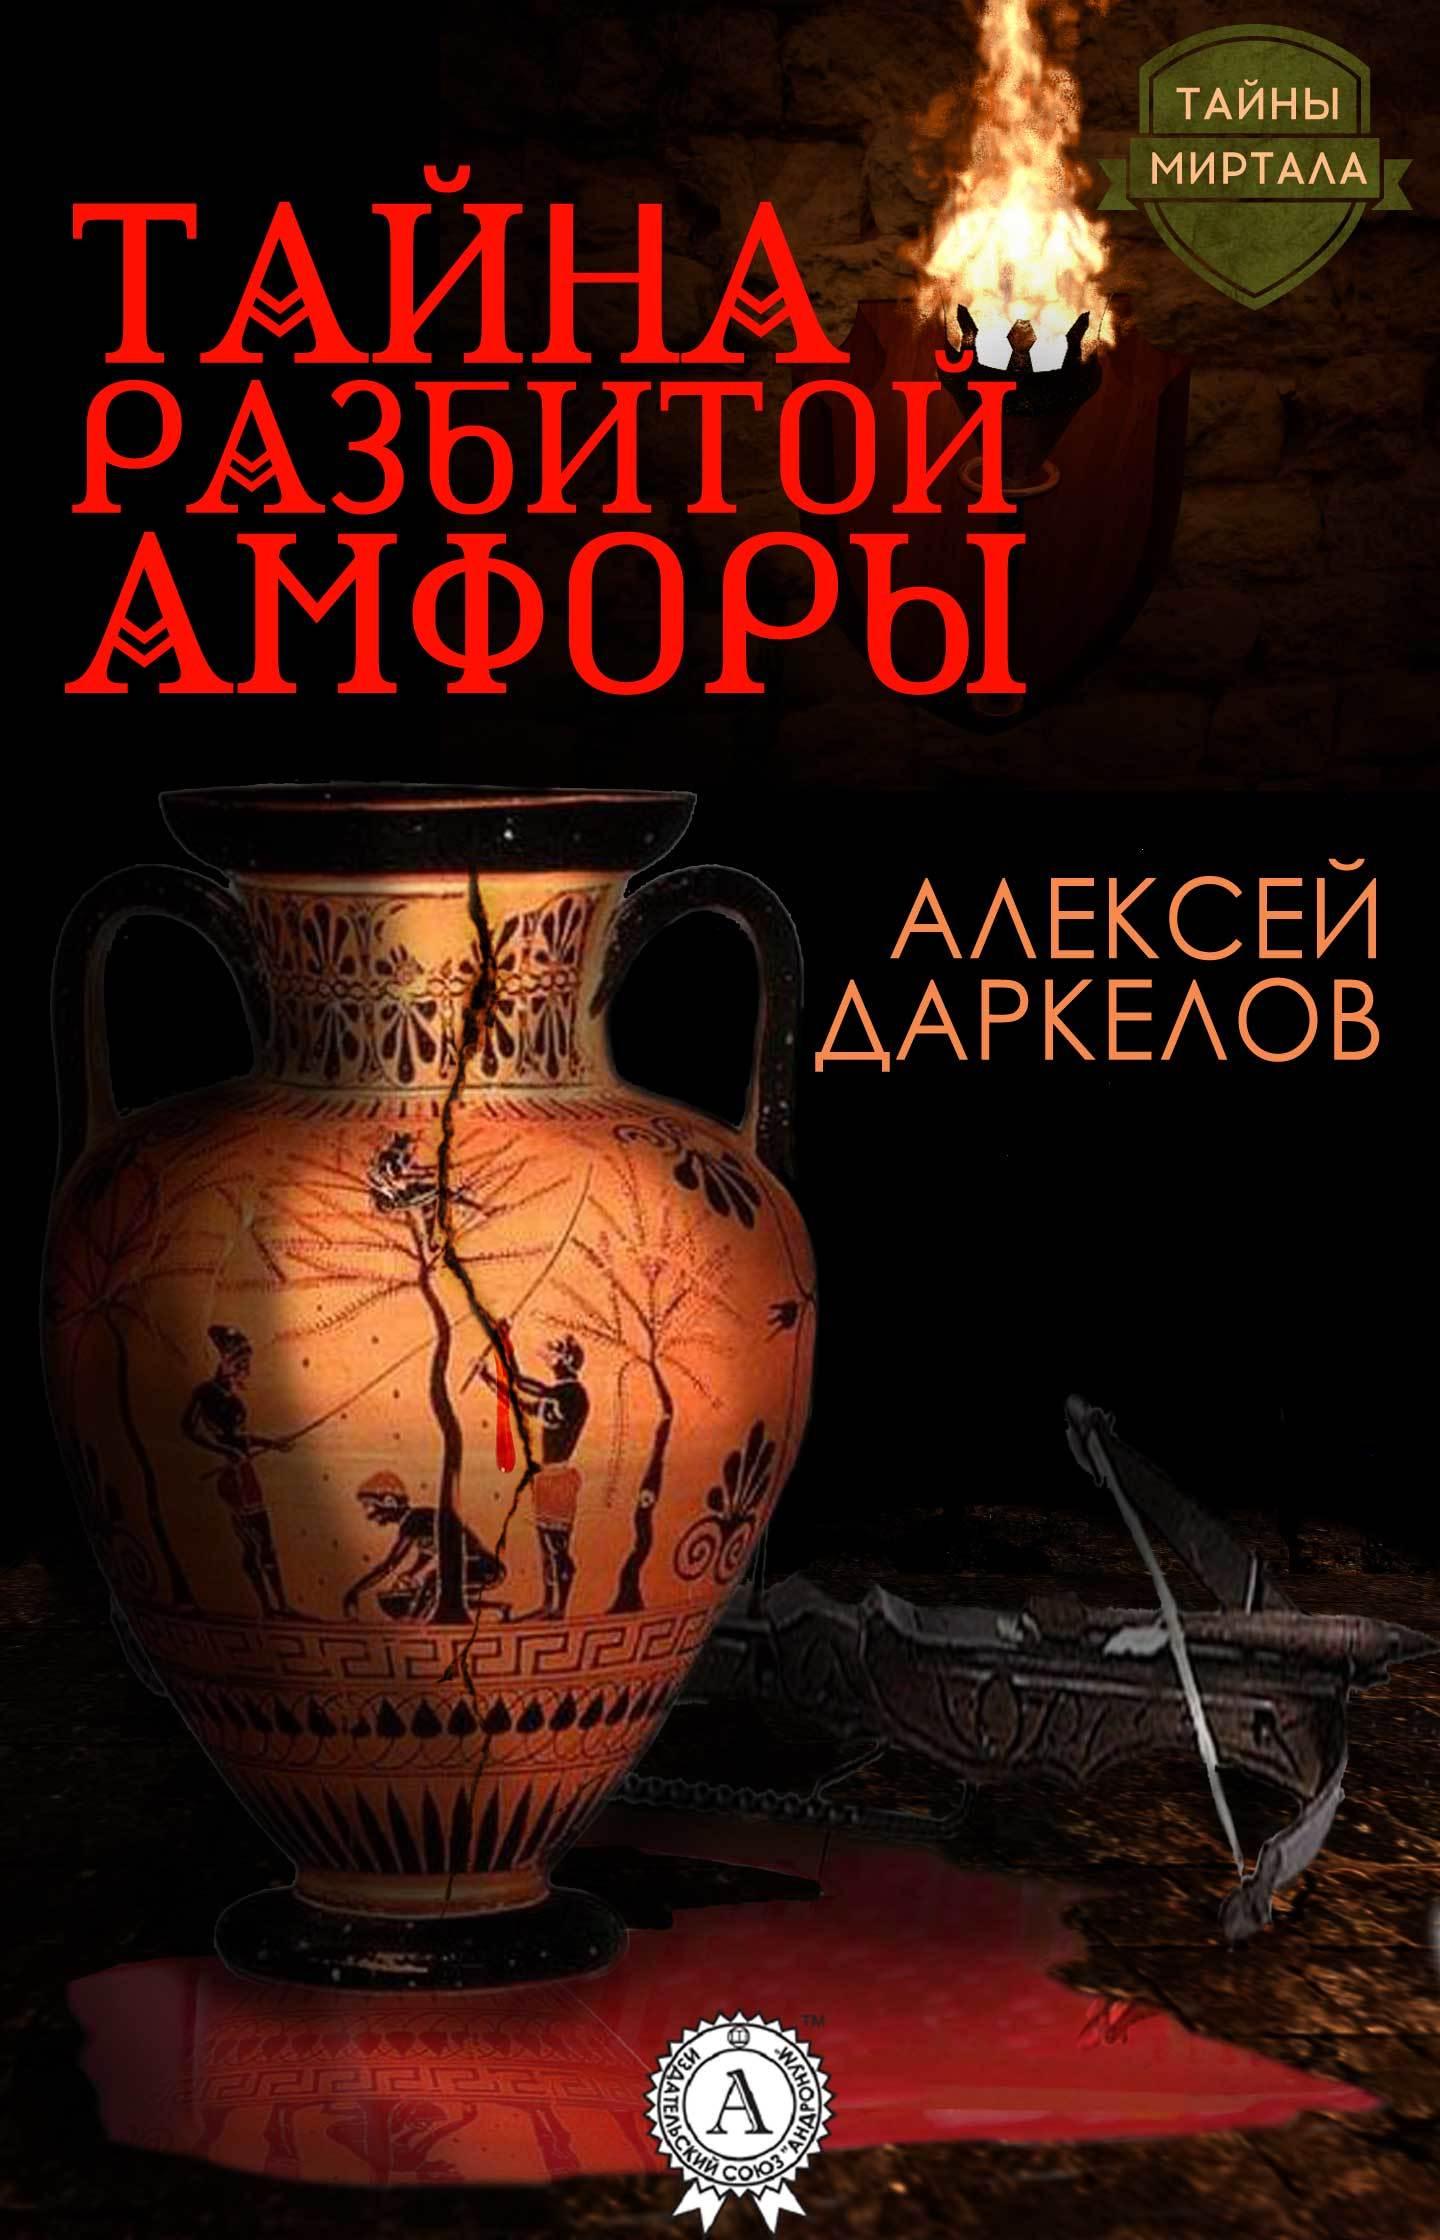 Алексей Даркелов «Тайна разбитой амфоры»